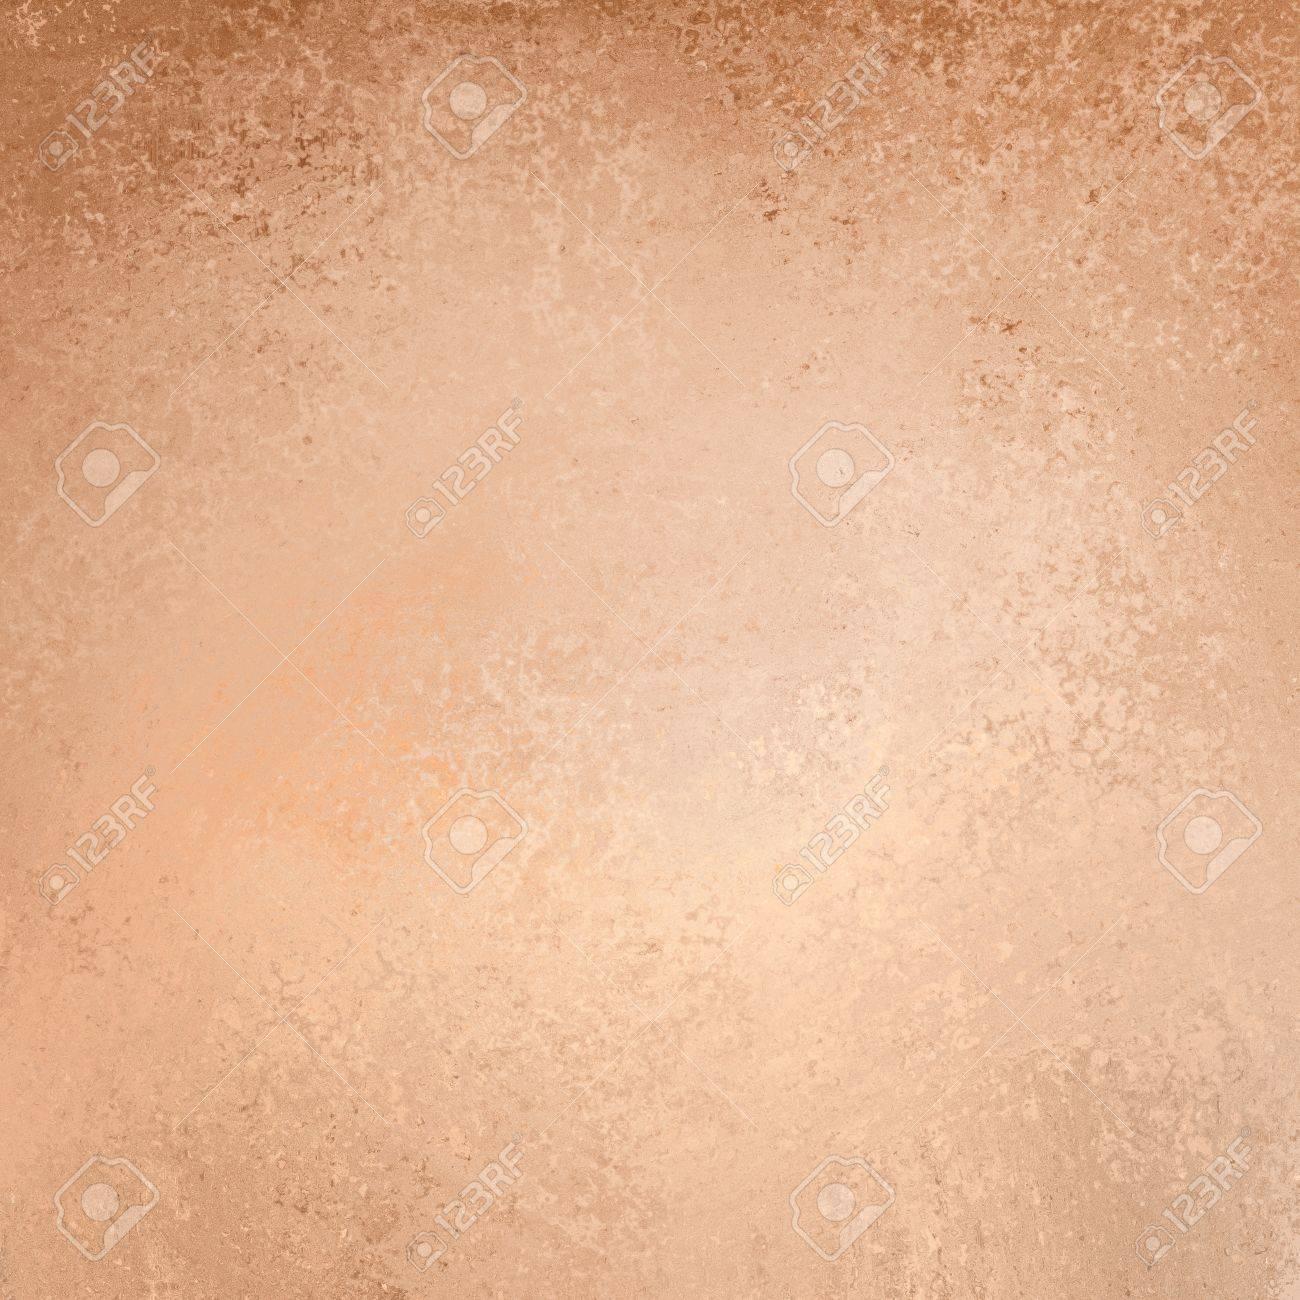 Light Brown And Peach Paper Background With Fine Grunge Texture Old Worn Vintage Design